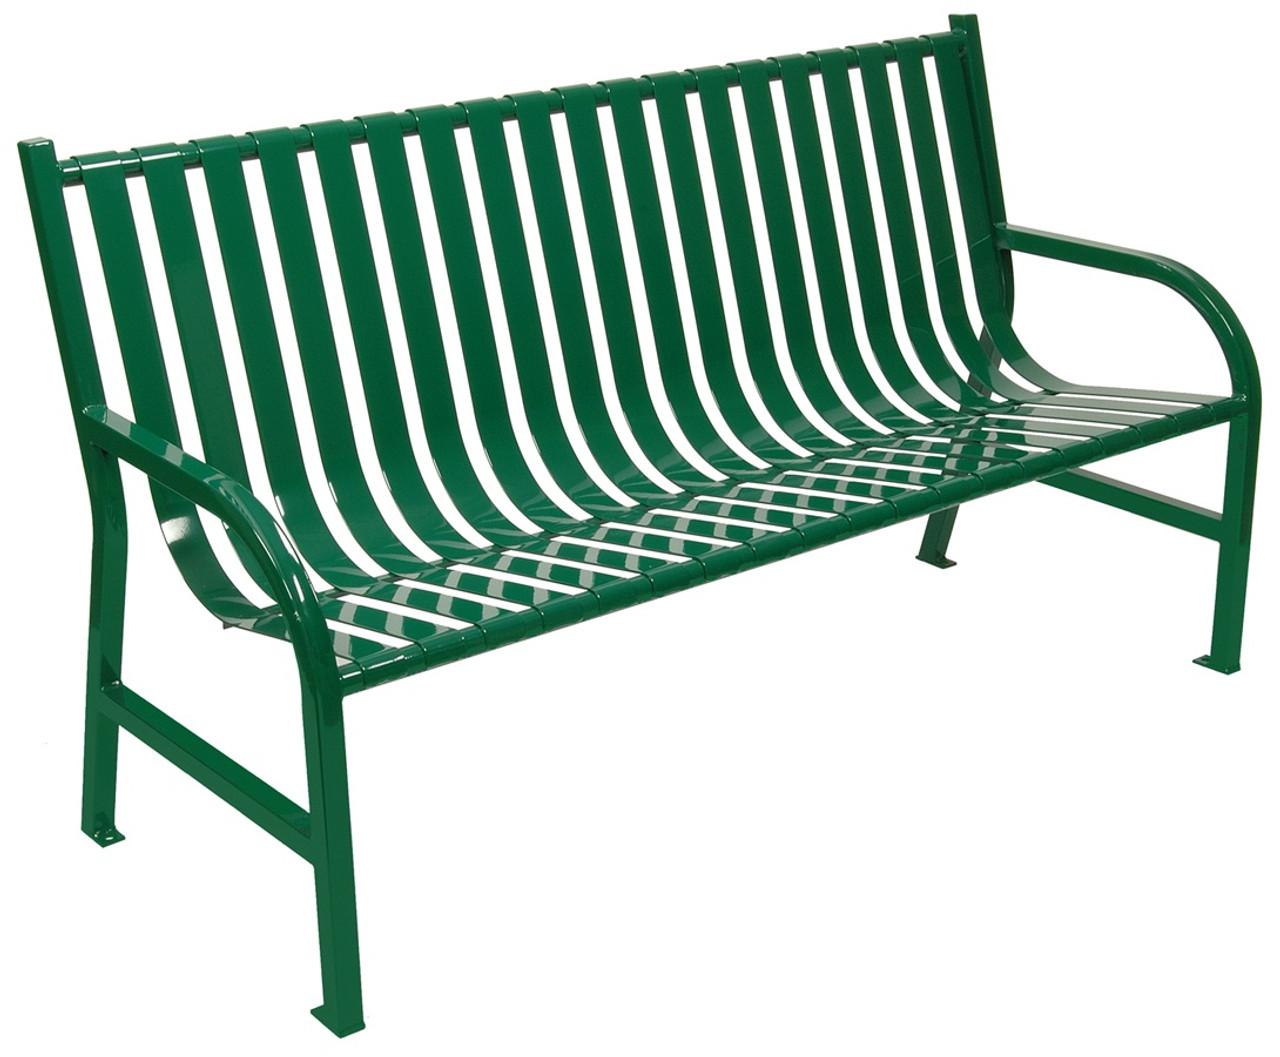 Witt Industries Oakley Outdoor Slatted Bench 5 Foot Green